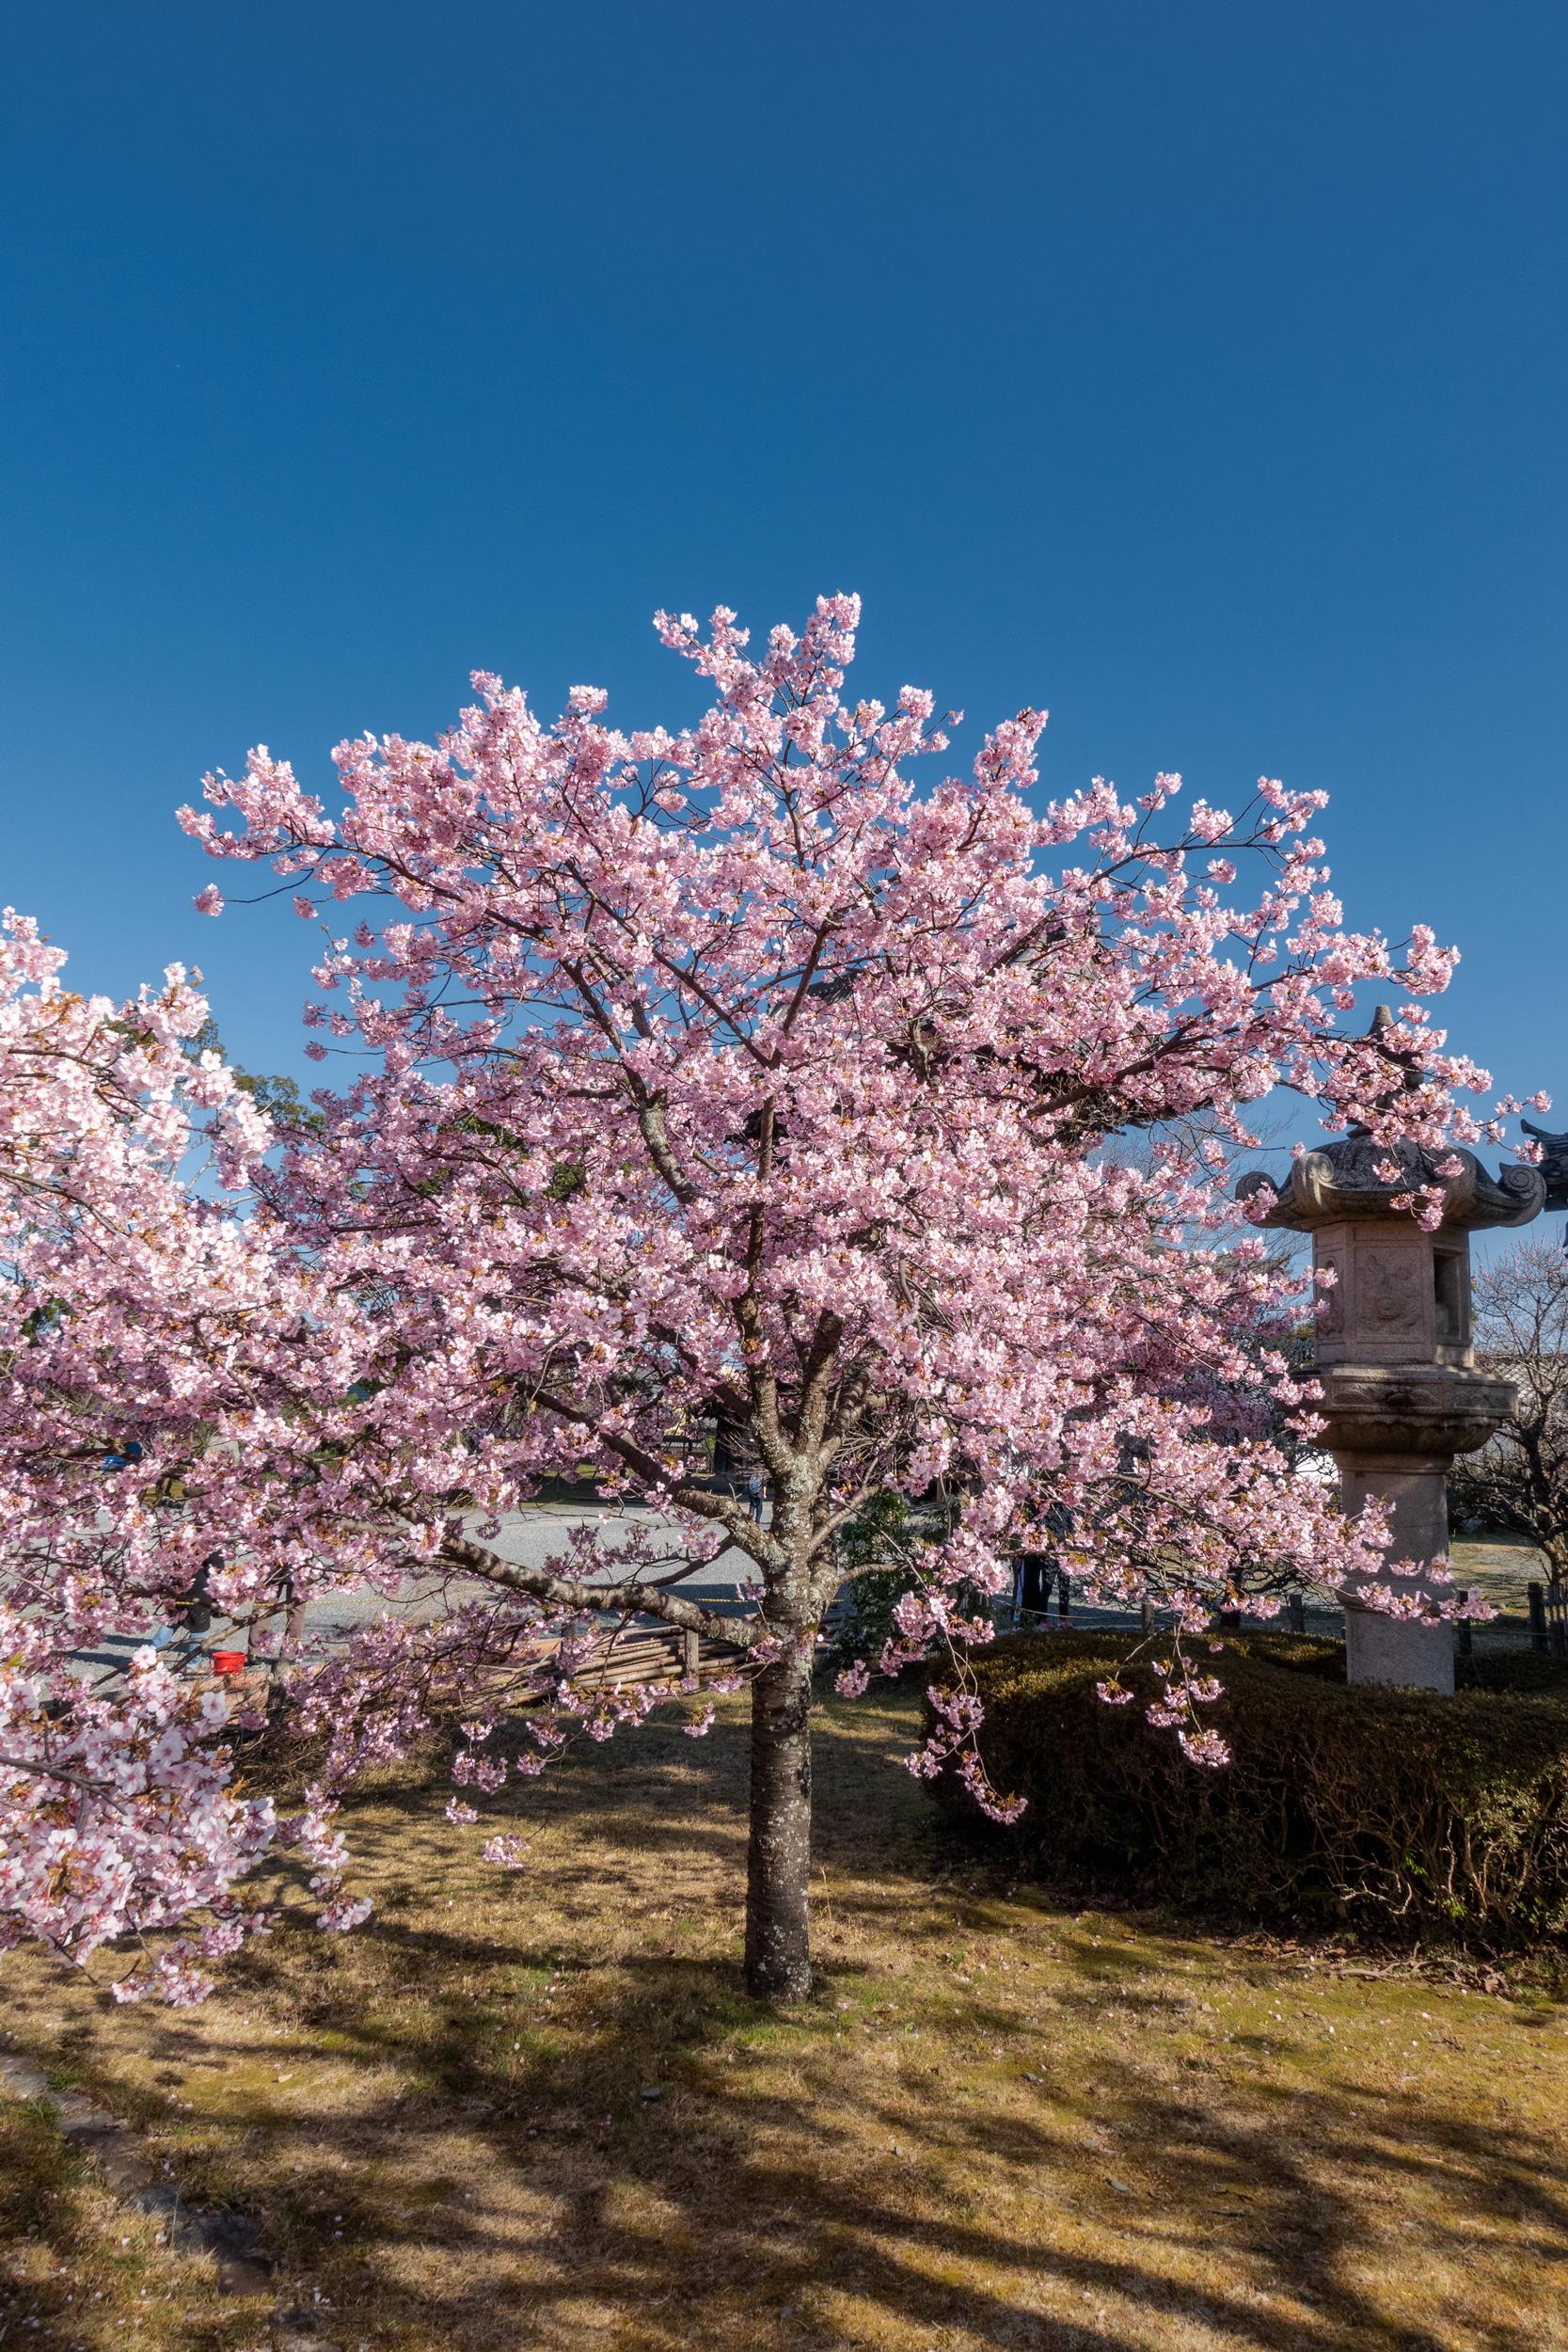 DSC03238 京都府 清凉寺(多宝塔と河津桜の美しい景色! 京都の春におすすめ桜写真スポット!撮影した写真の紹介、 アクセス方法や駐車場、桜の開花状況など)